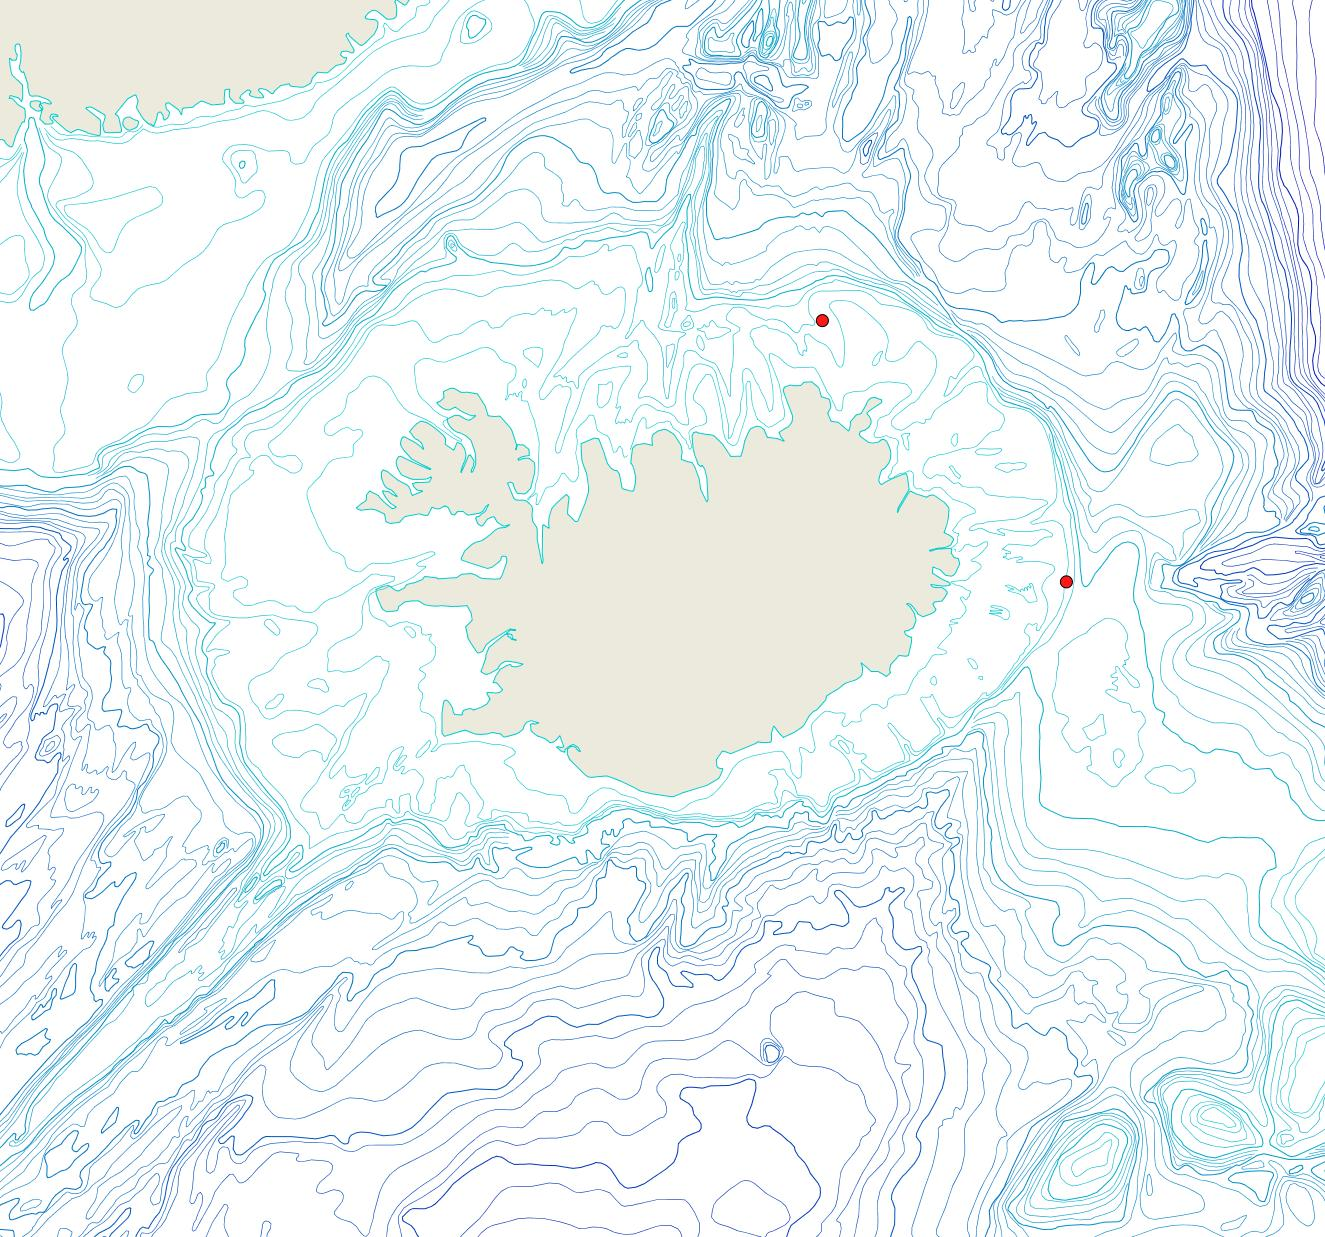 Útbreiðsla Parasmittina jeffreysi(Bioice samples, red dots)